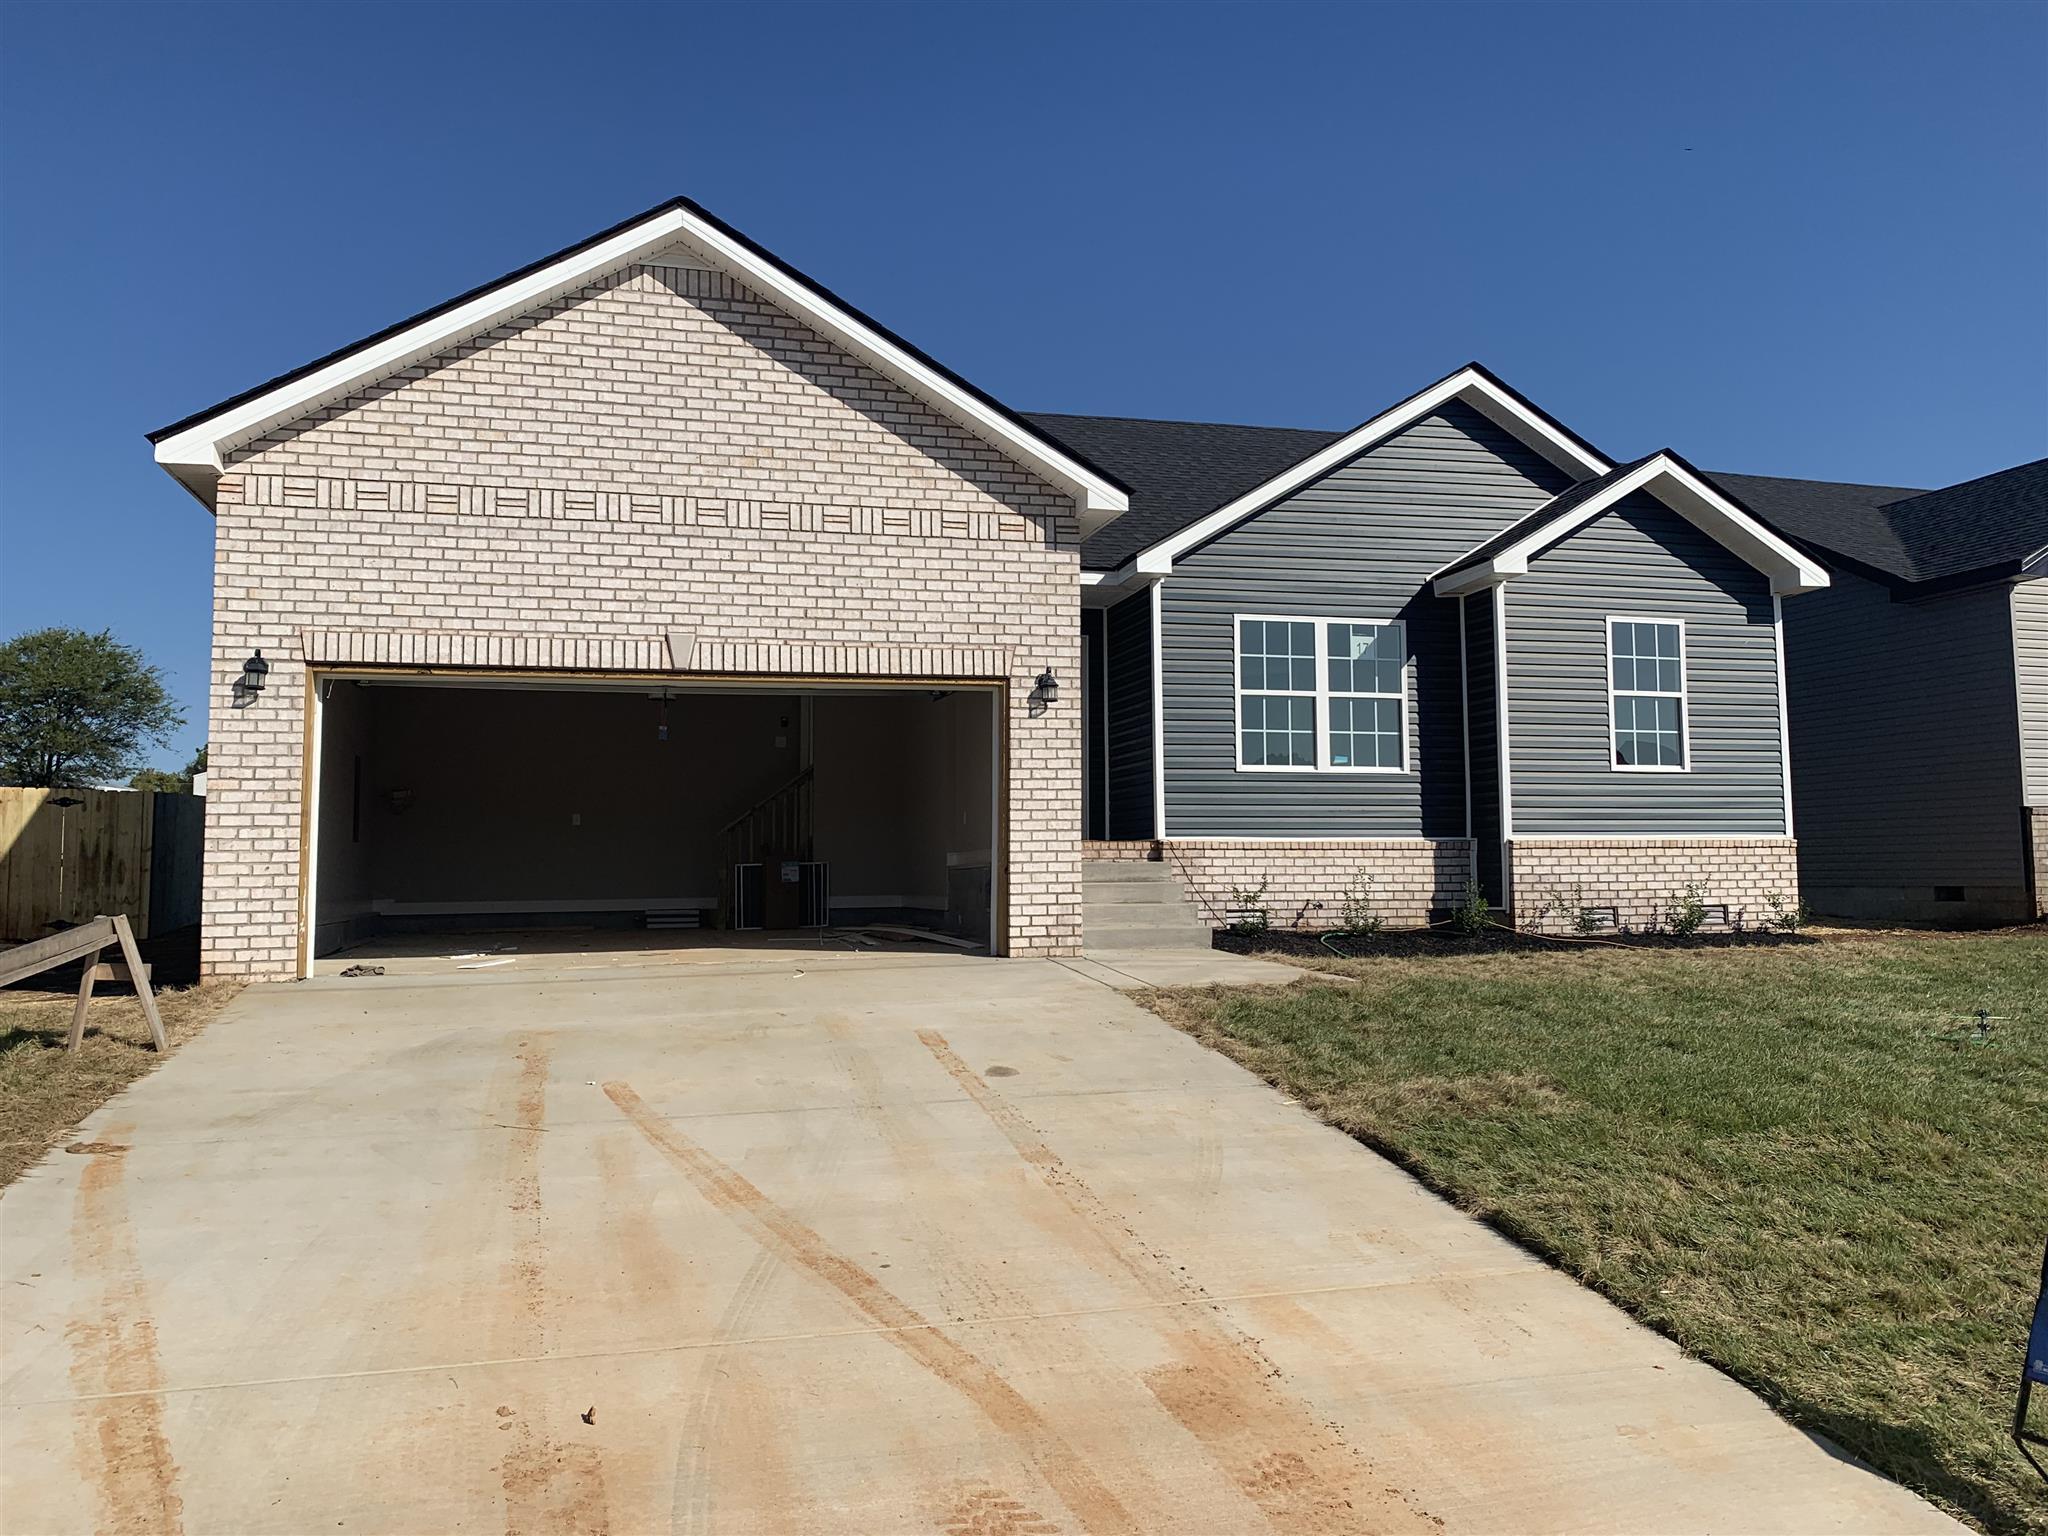 17 ROSE EDD, Oak Grove, KY 42262 - Oak Grove, KY real estate listing